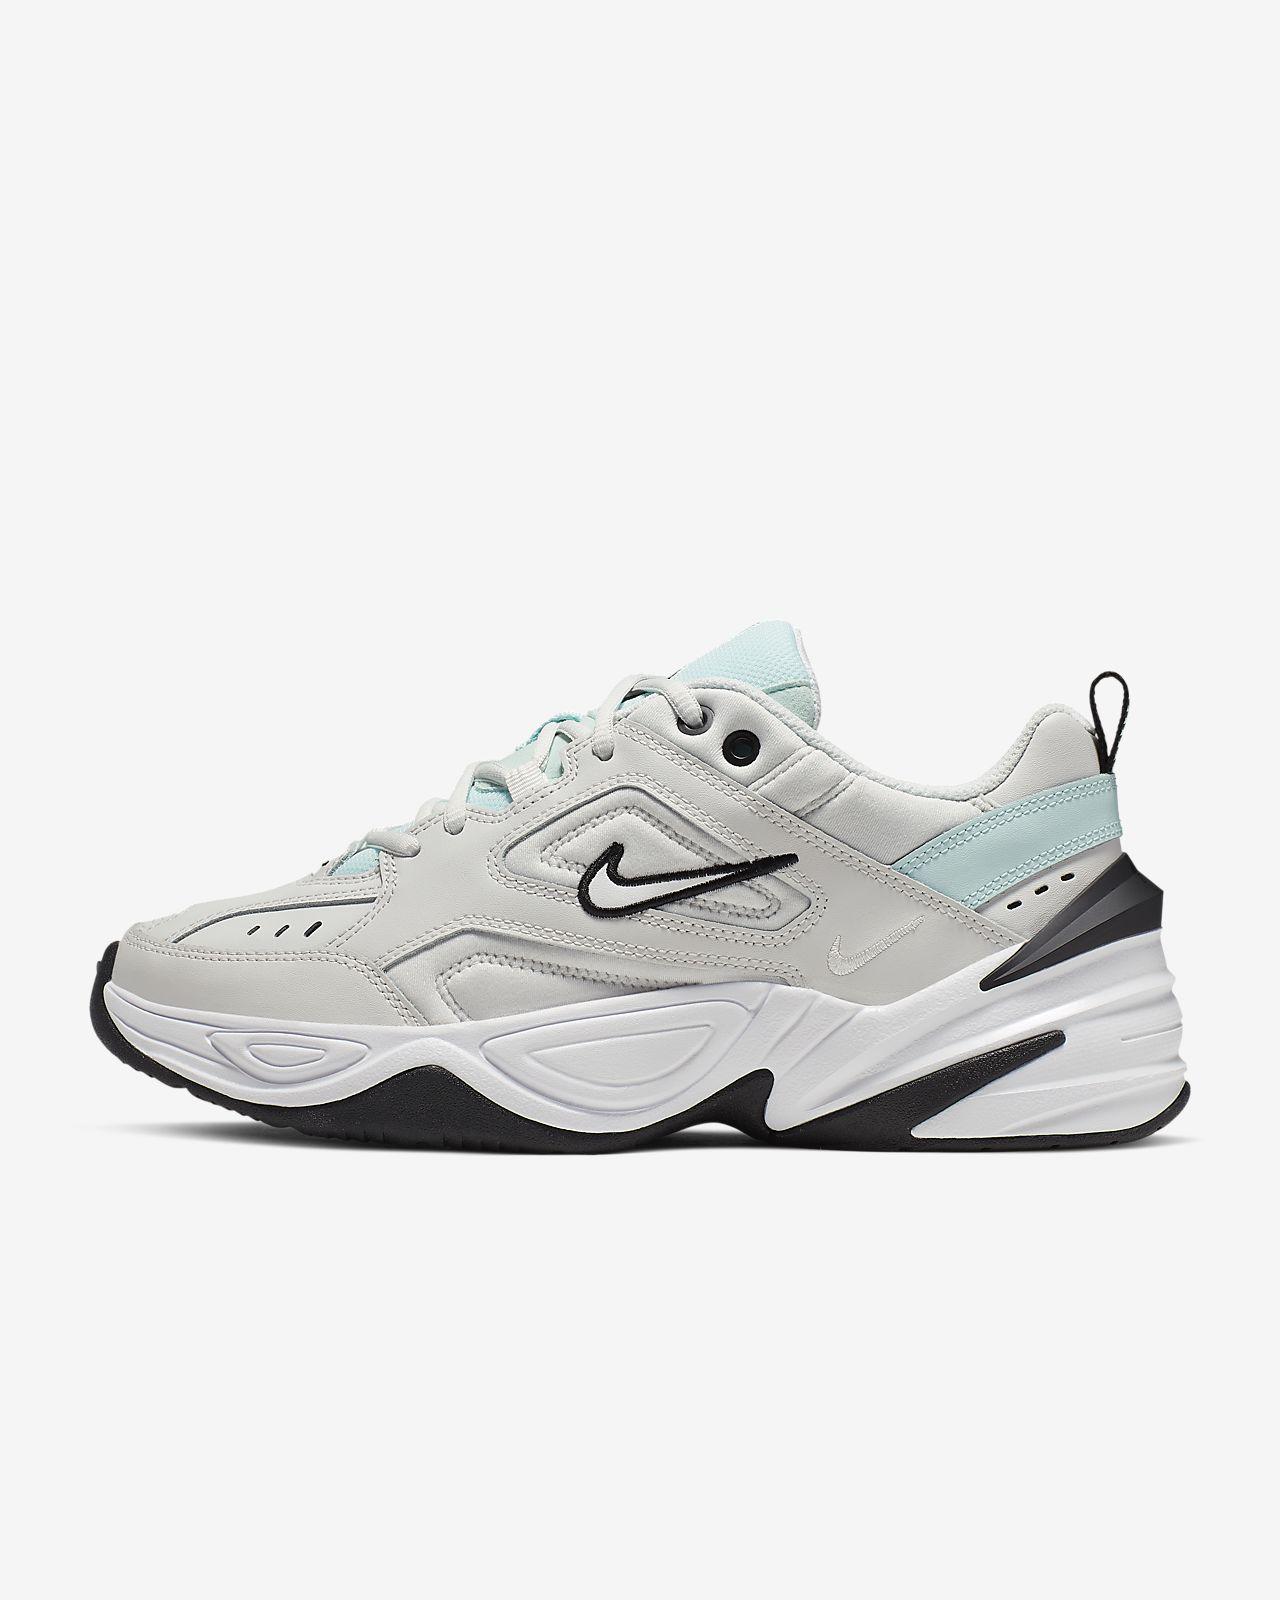 low priced 68752 ae7c1 ... Sko Nike M2K Tekno